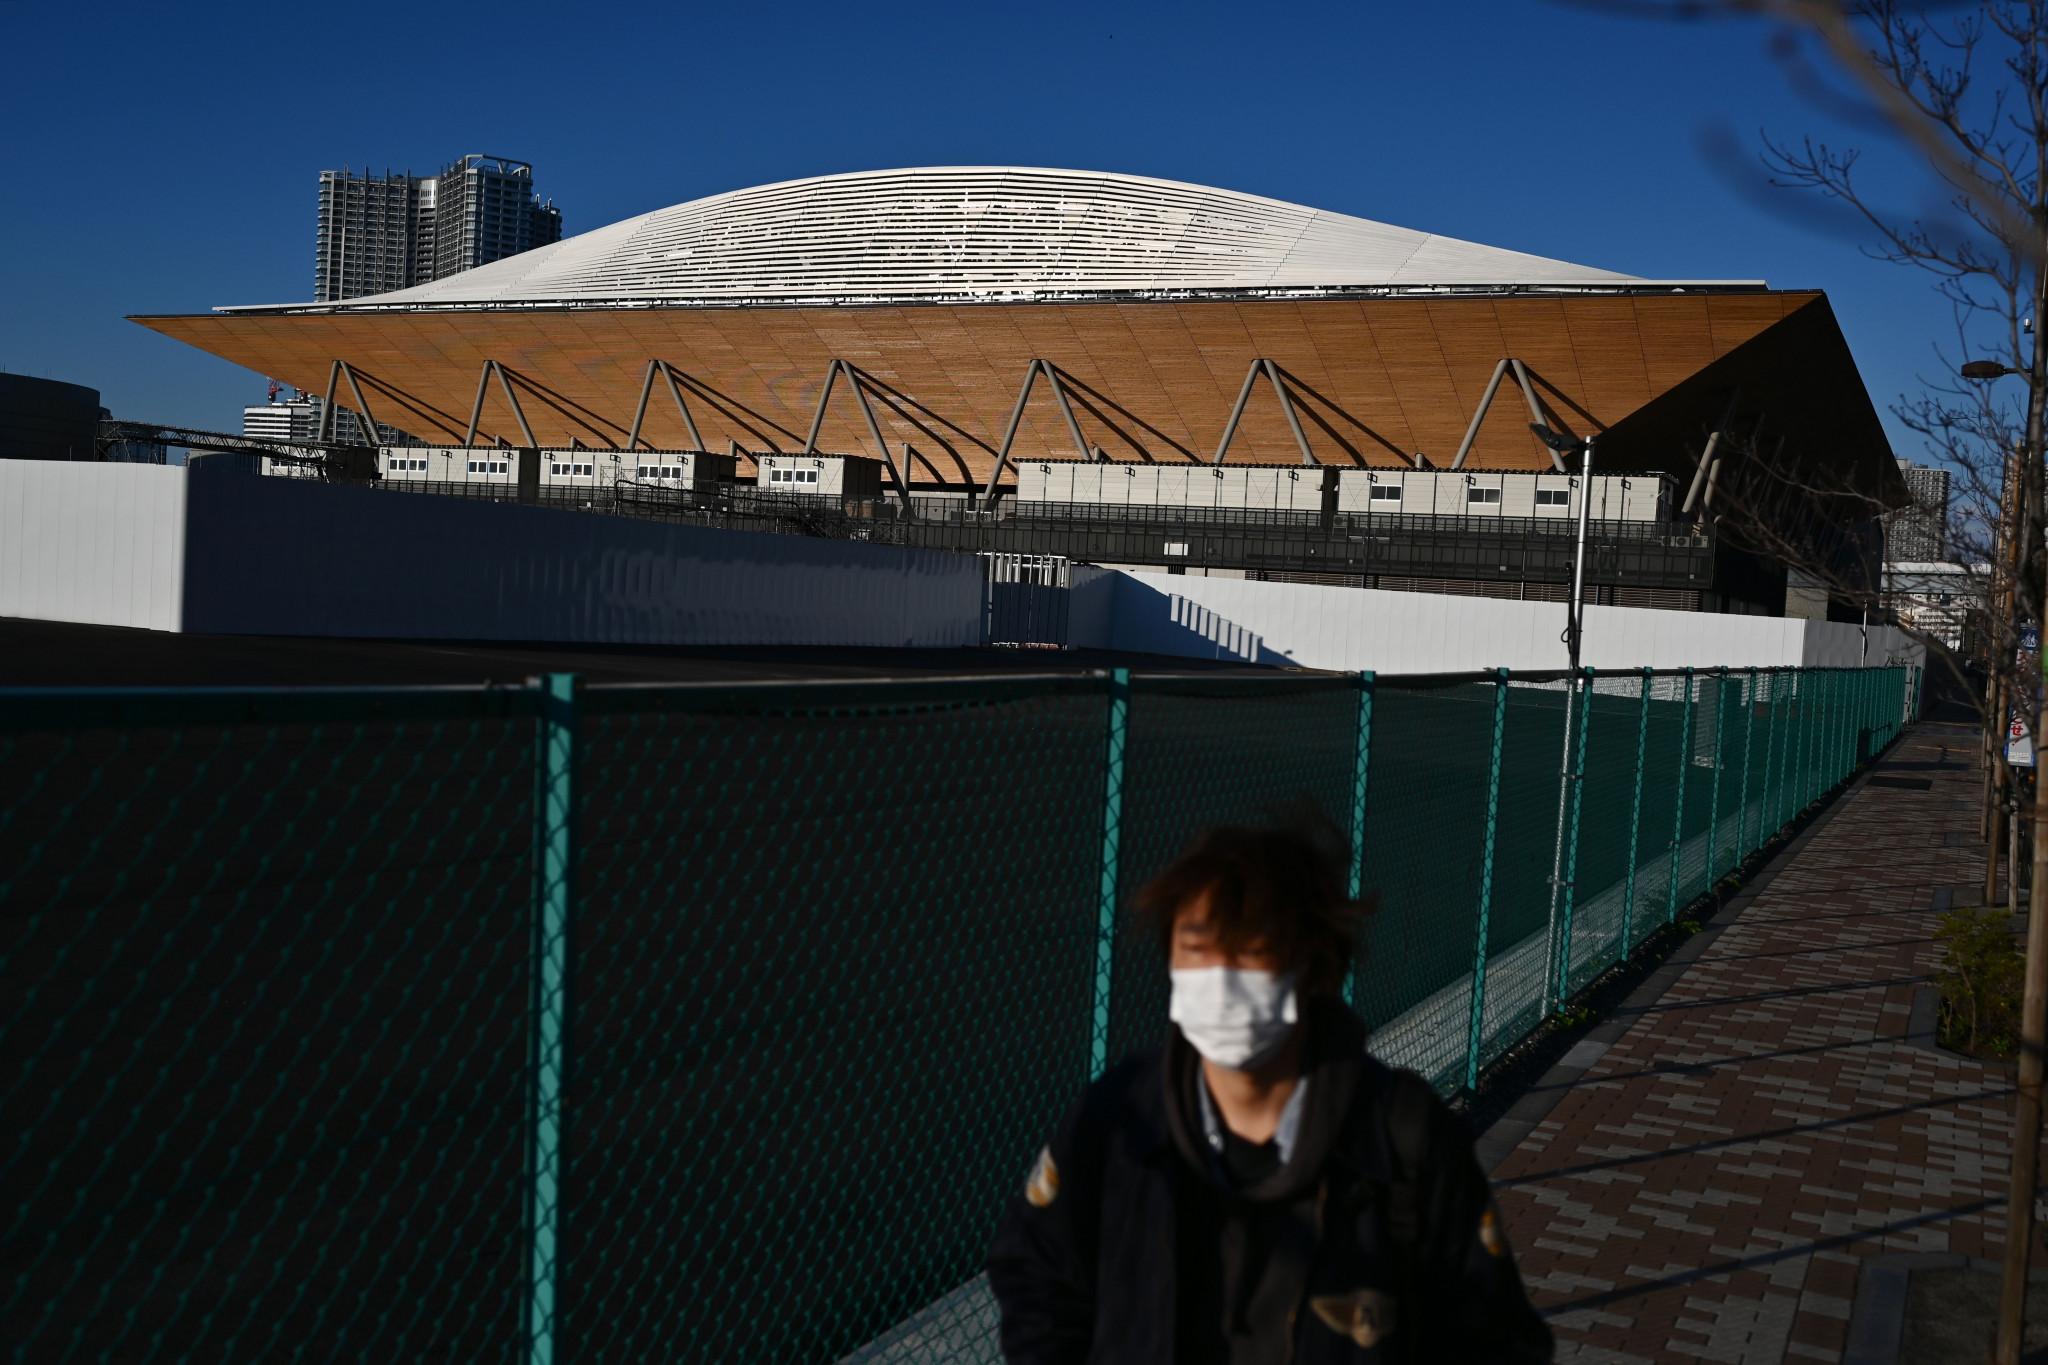 Tokyo 2020 venue for gymnastics and boccia wins environment award